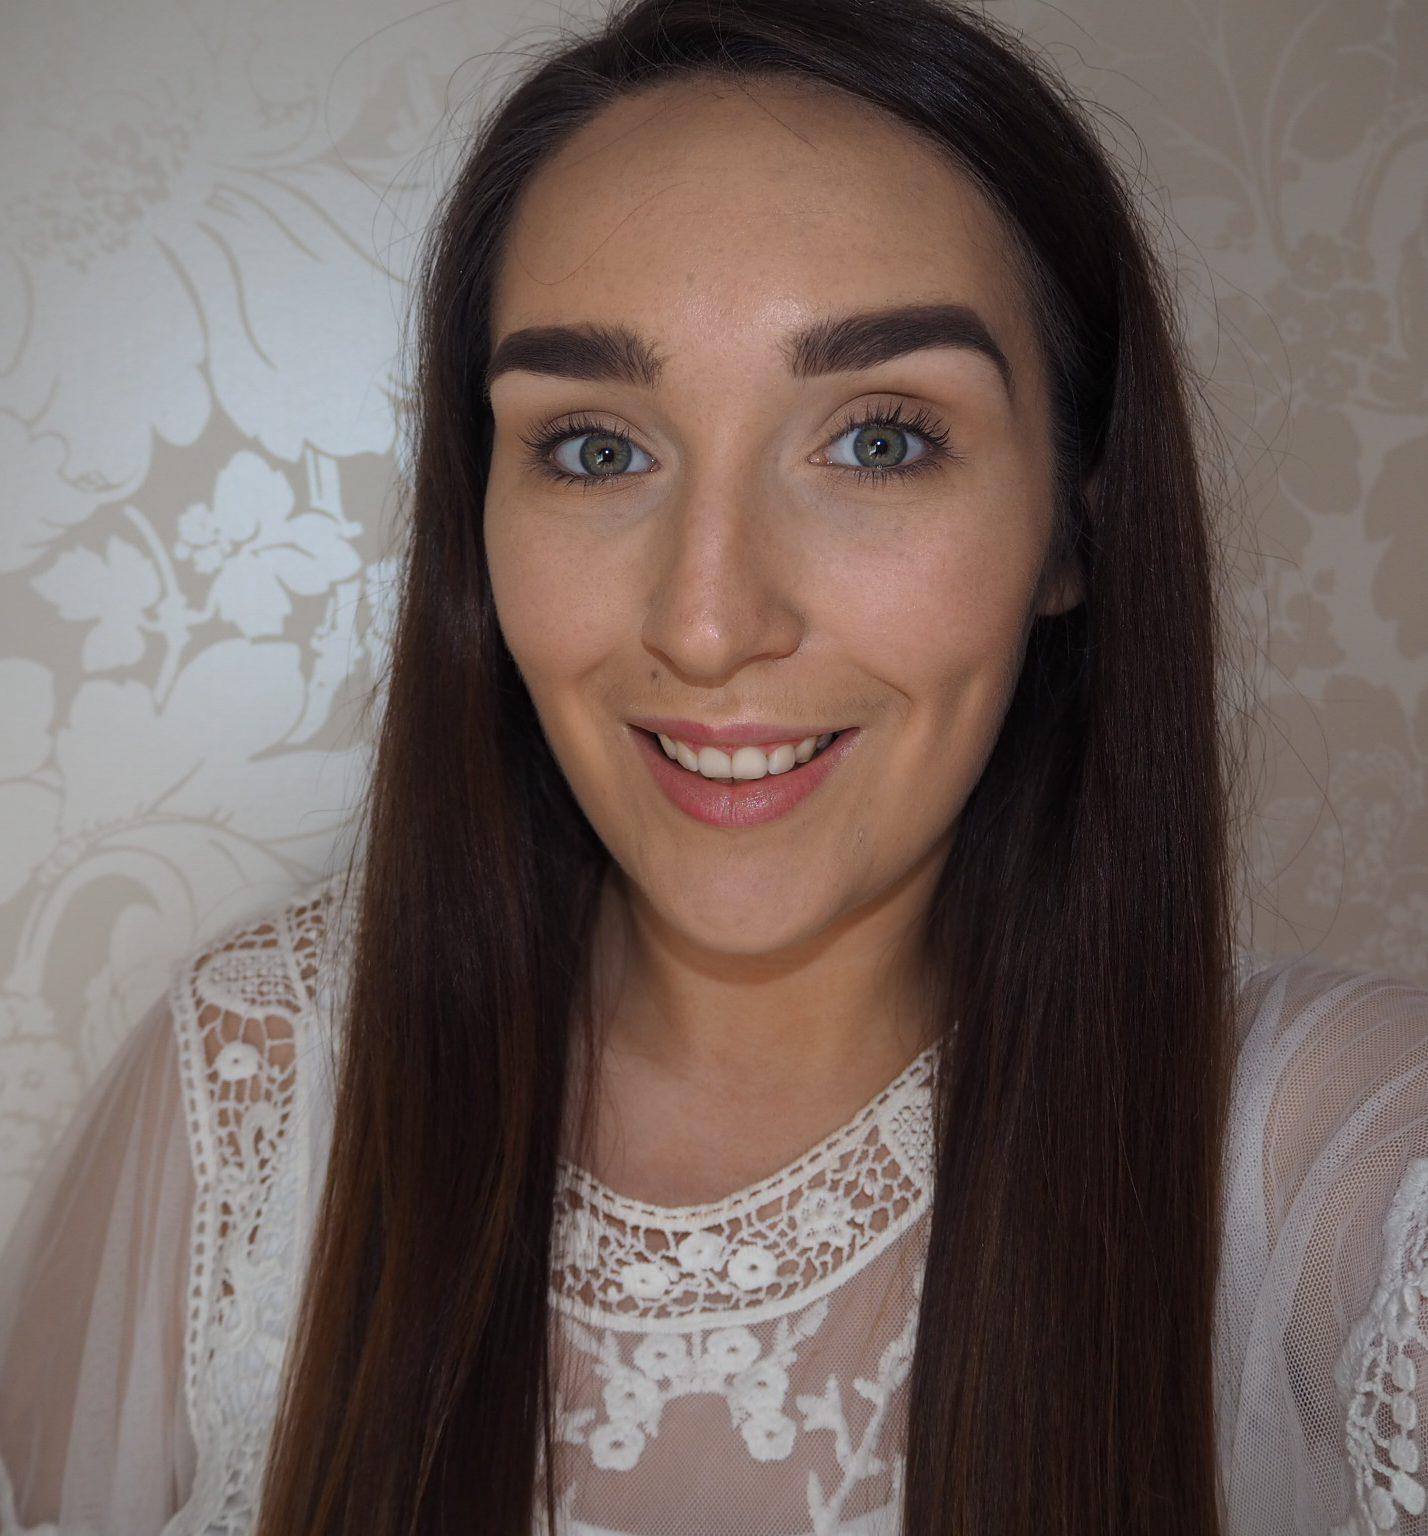 Blush Makeup Review